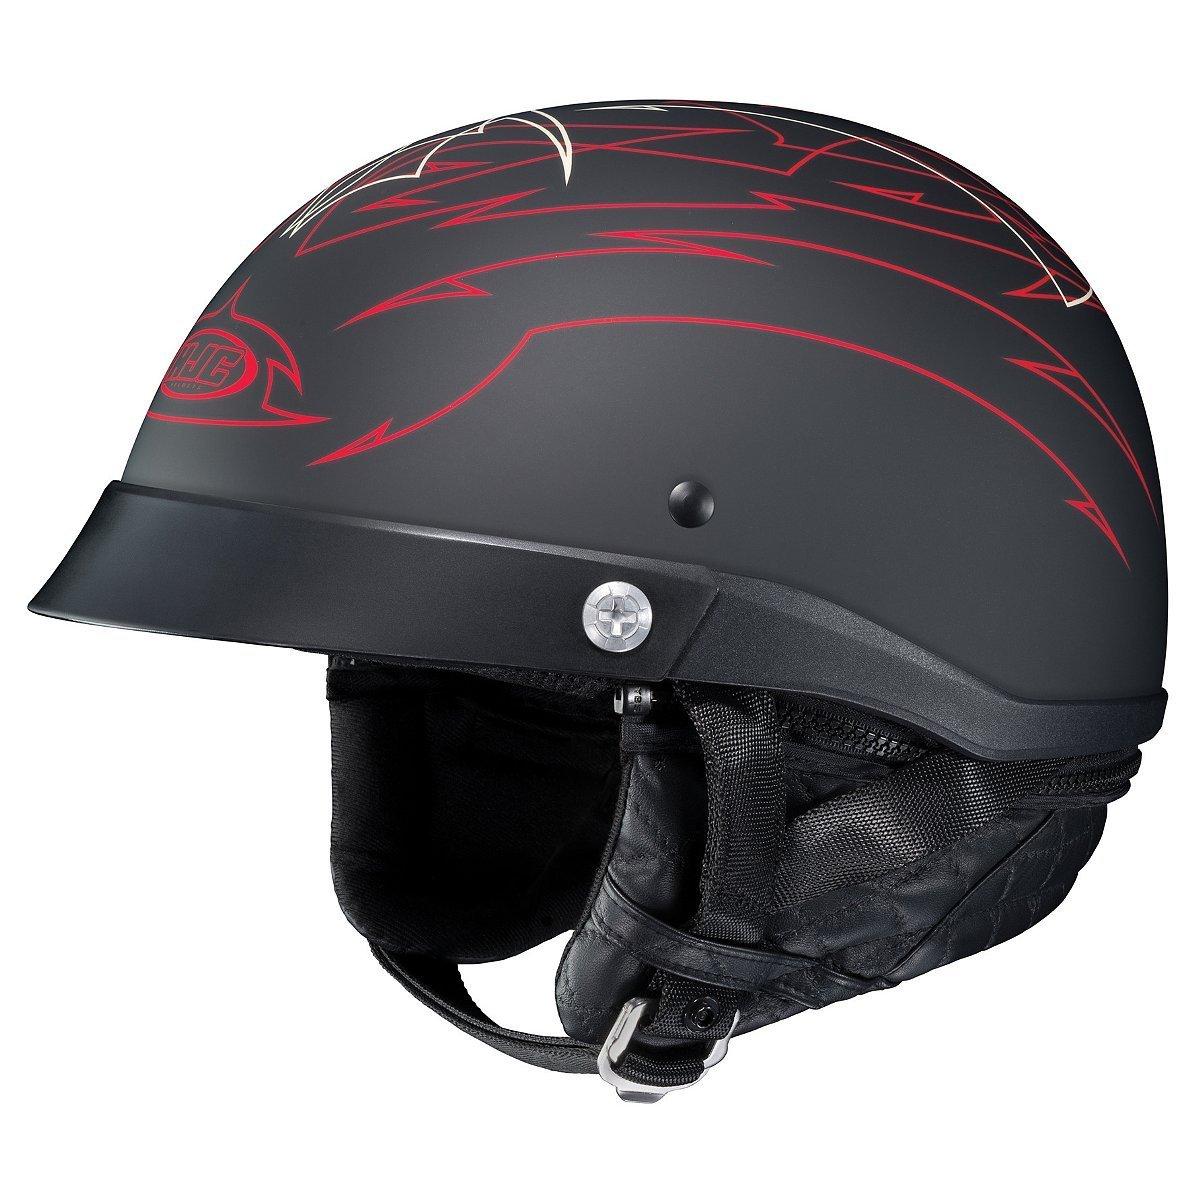 HJC Helmets Unisex-Adult Half-Size-Helmet-Style CL-Iron Road Show Boat MC1F Helmet (Black/Red, X-Large)